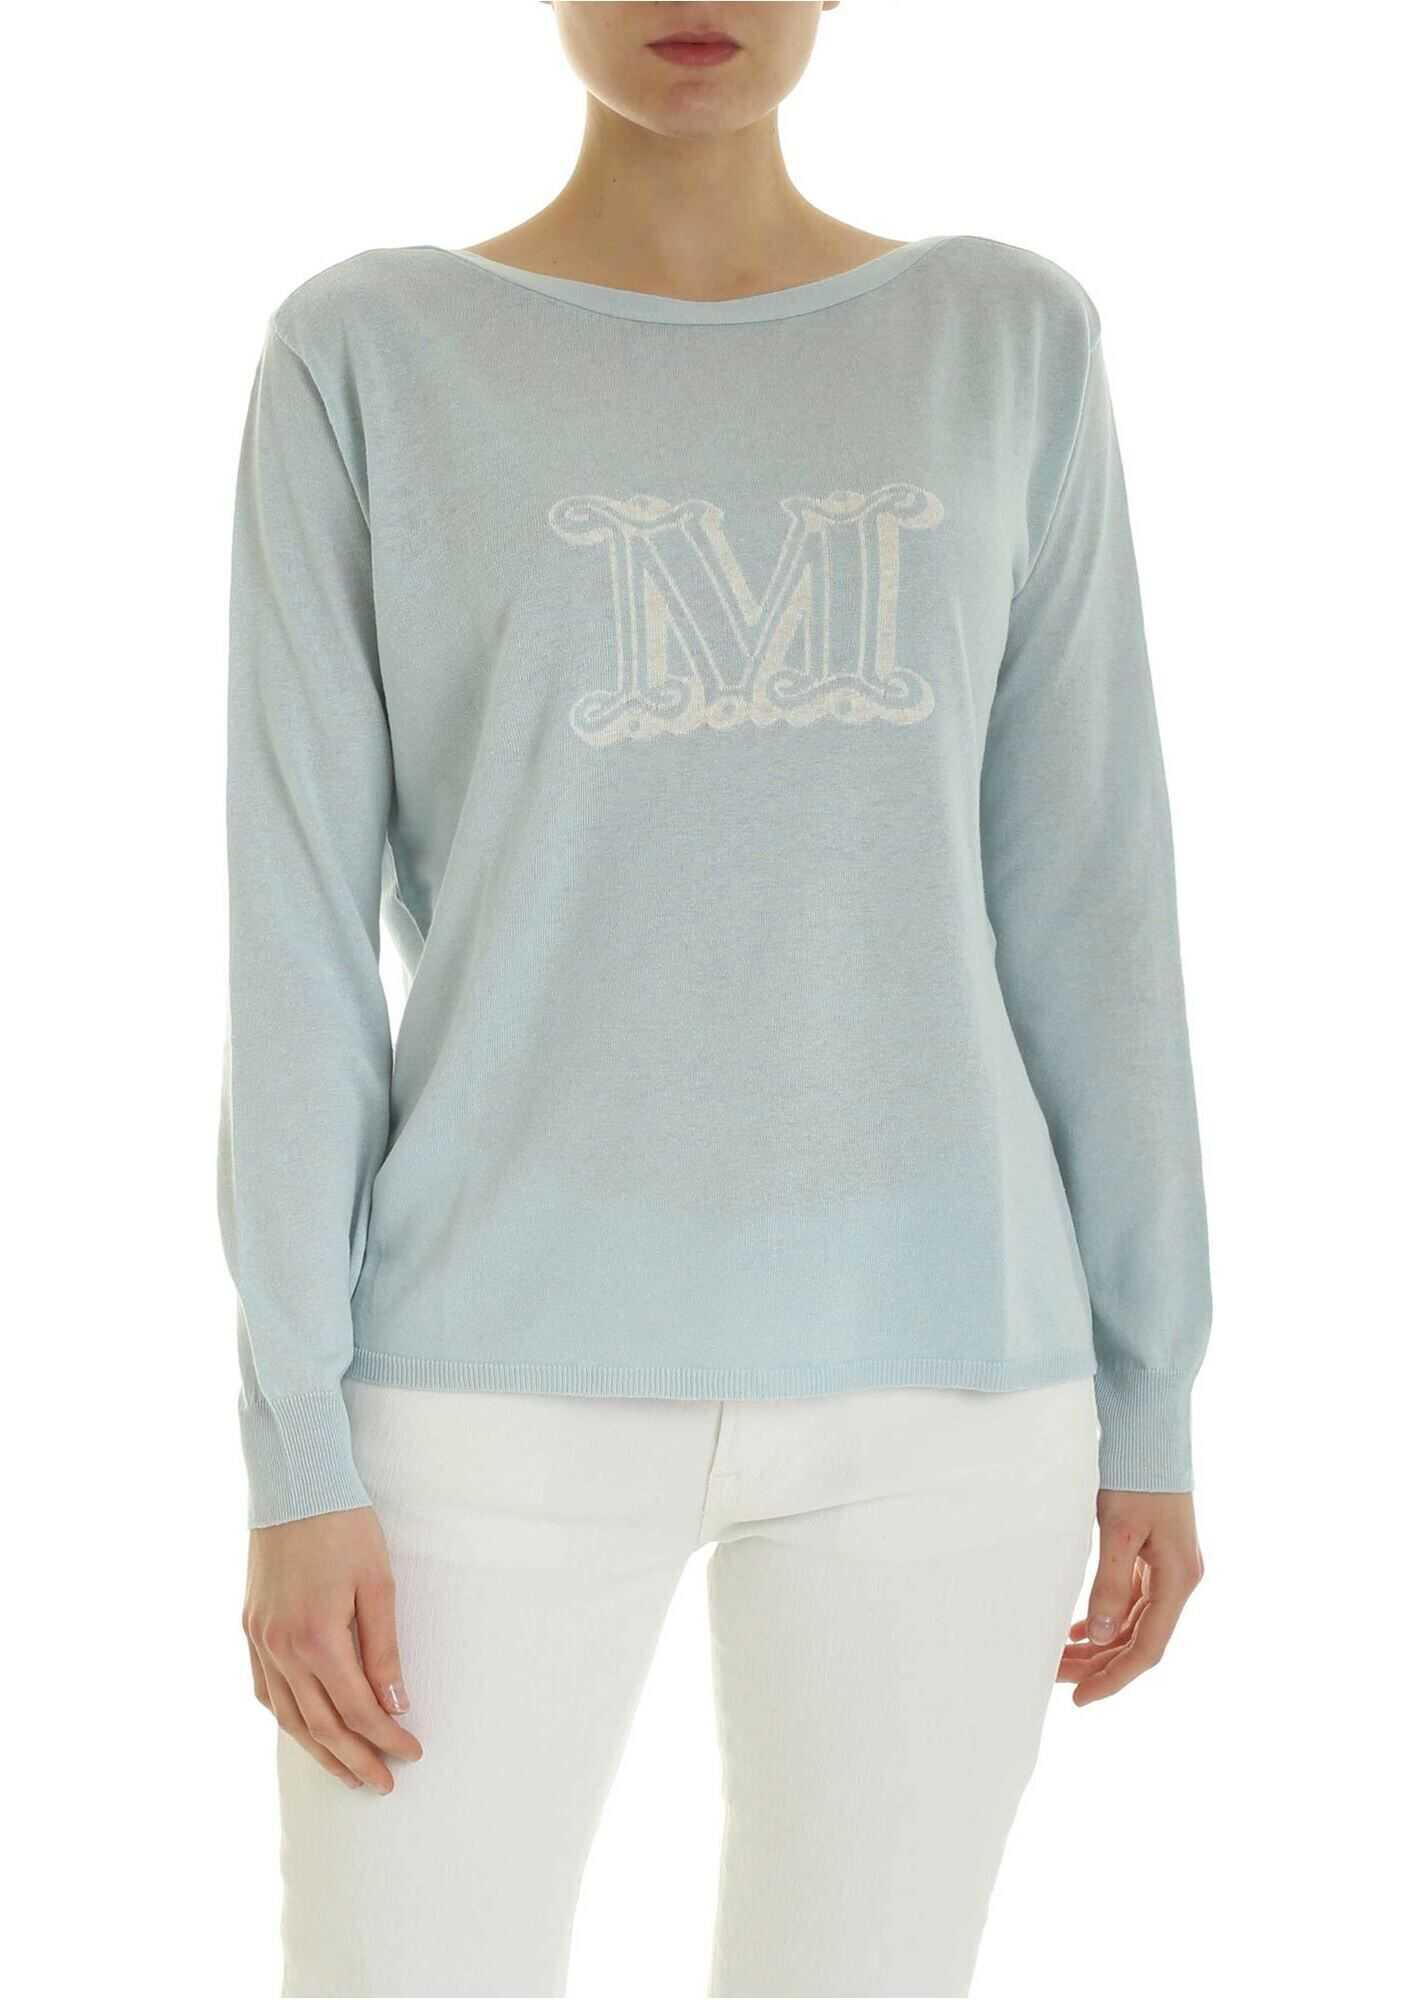 Max Mara Salice Sweater In Light Blue With Logo Light Blue